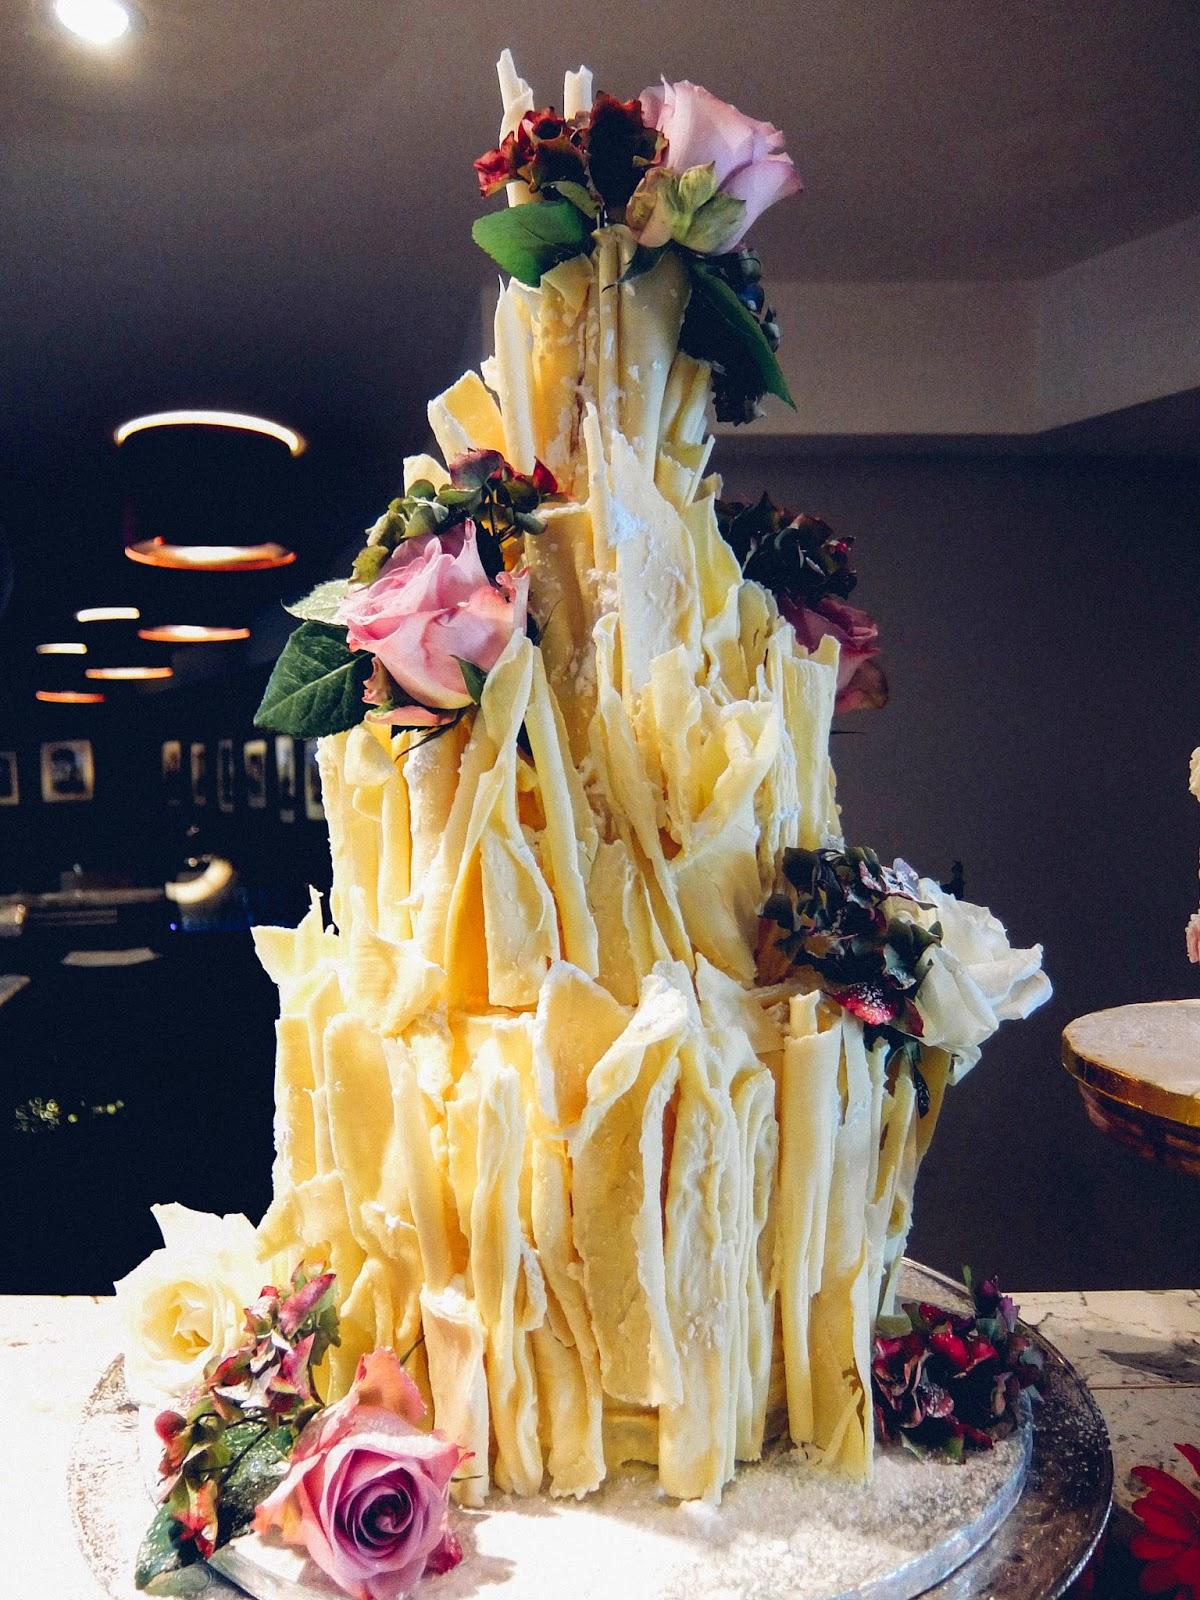 Bristol Vintage Wedding Fair: CHOCOLATE DELORES CAKES - DIVINE ...